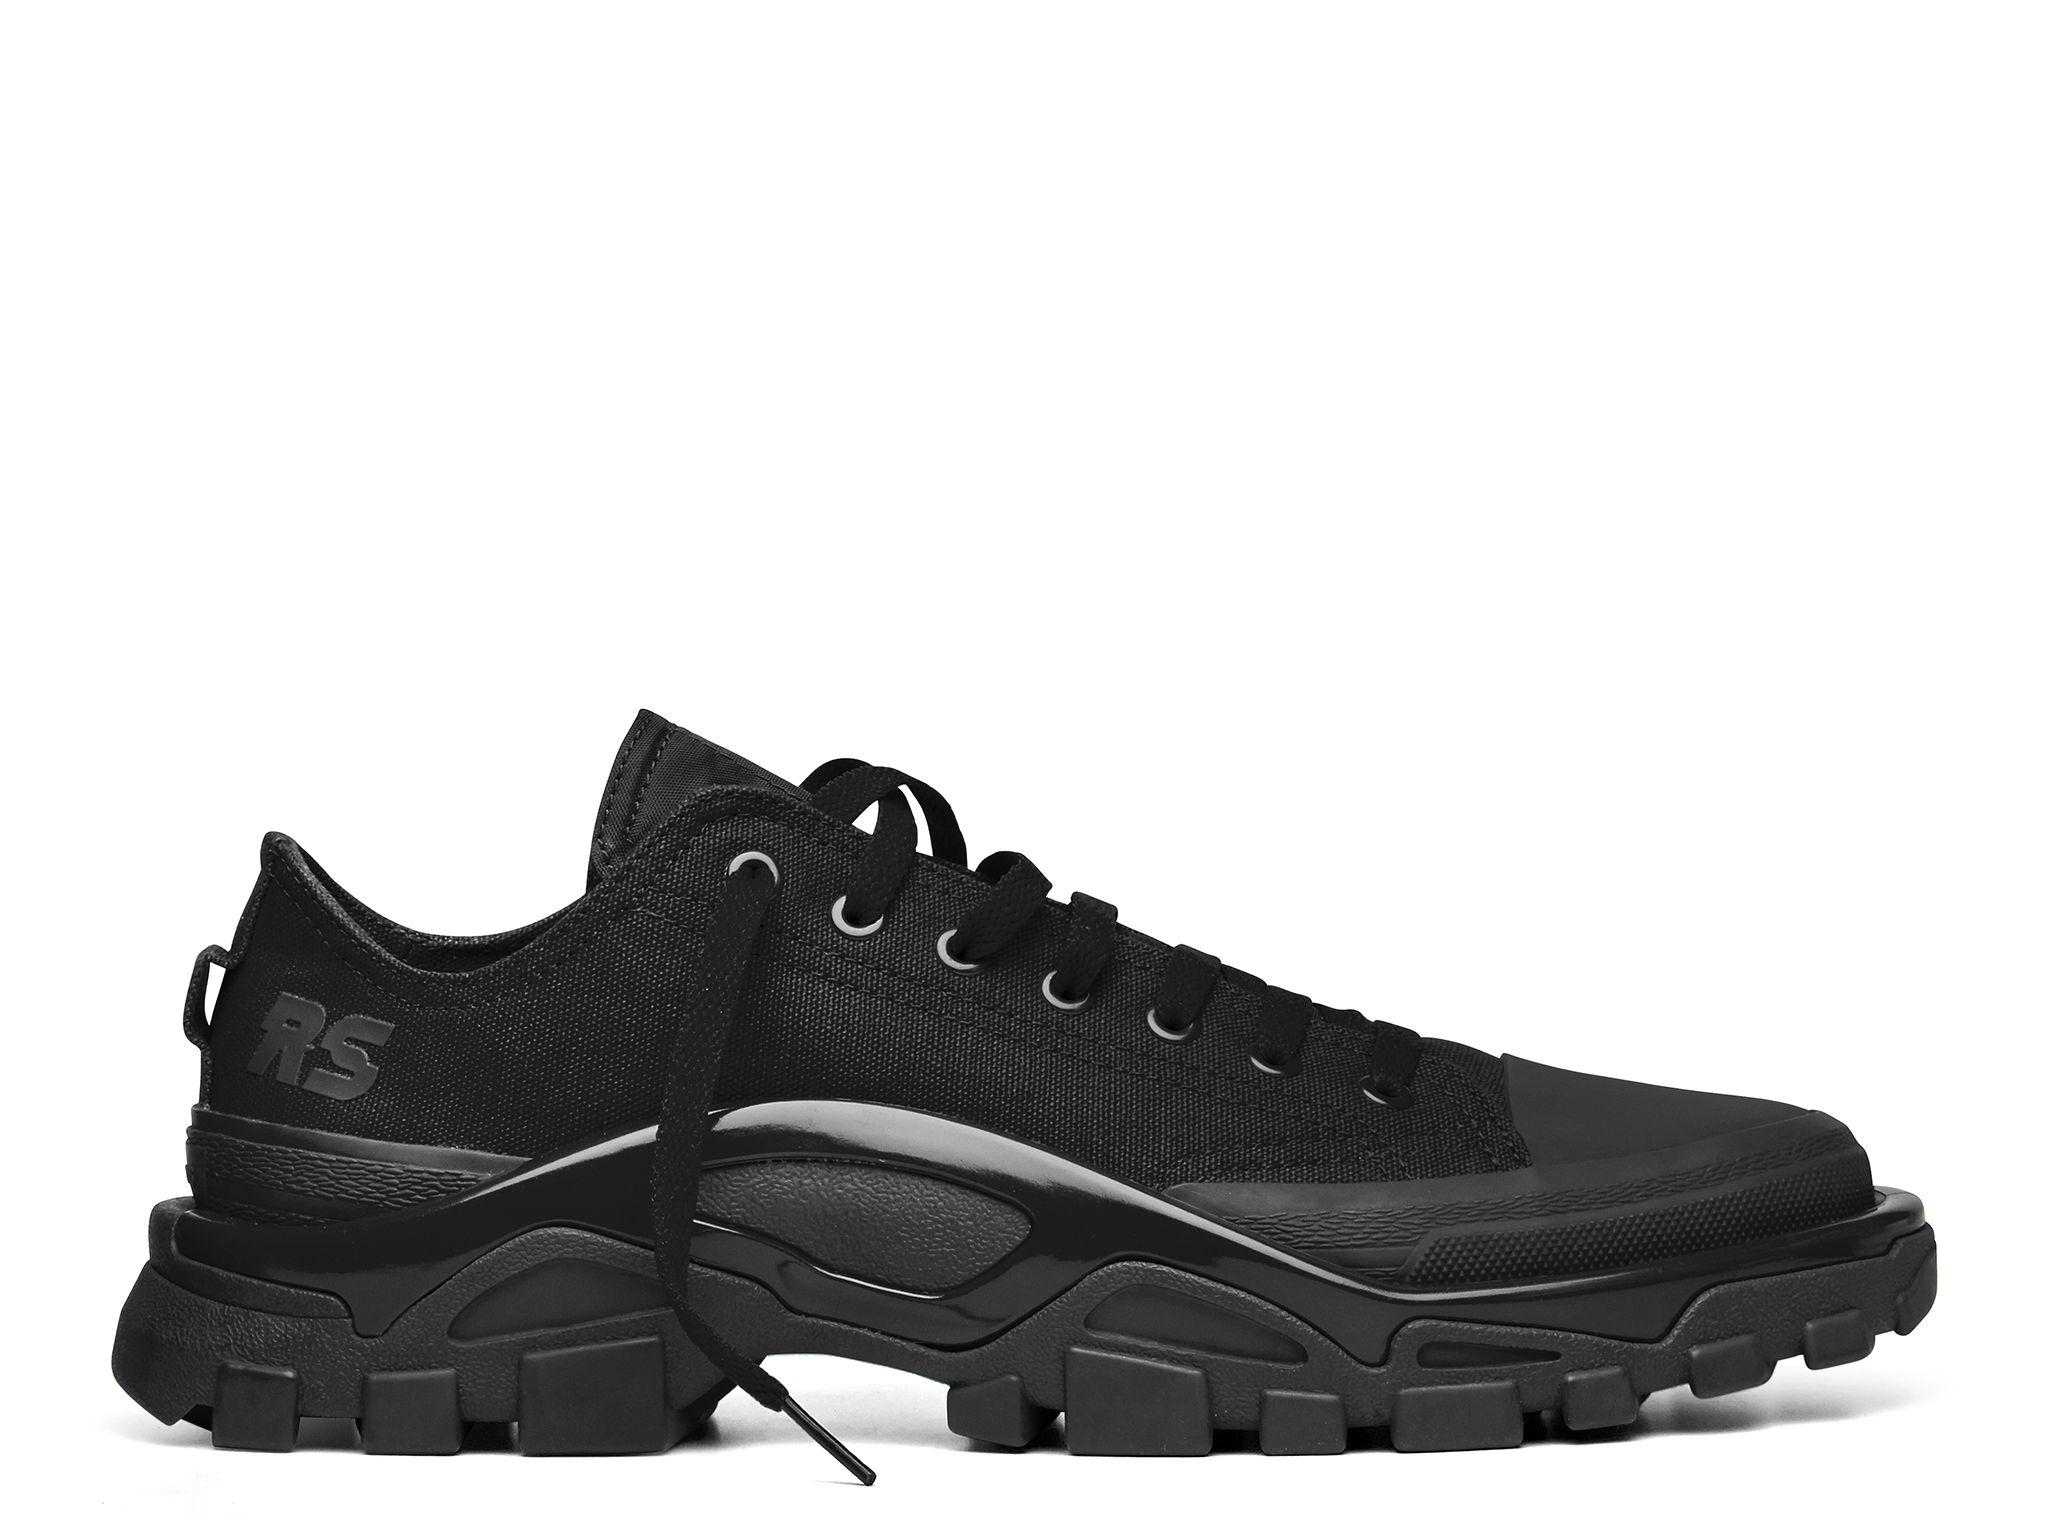 Raf Simons x Adidas Detroit Runner sneakerboy se cuela y botas